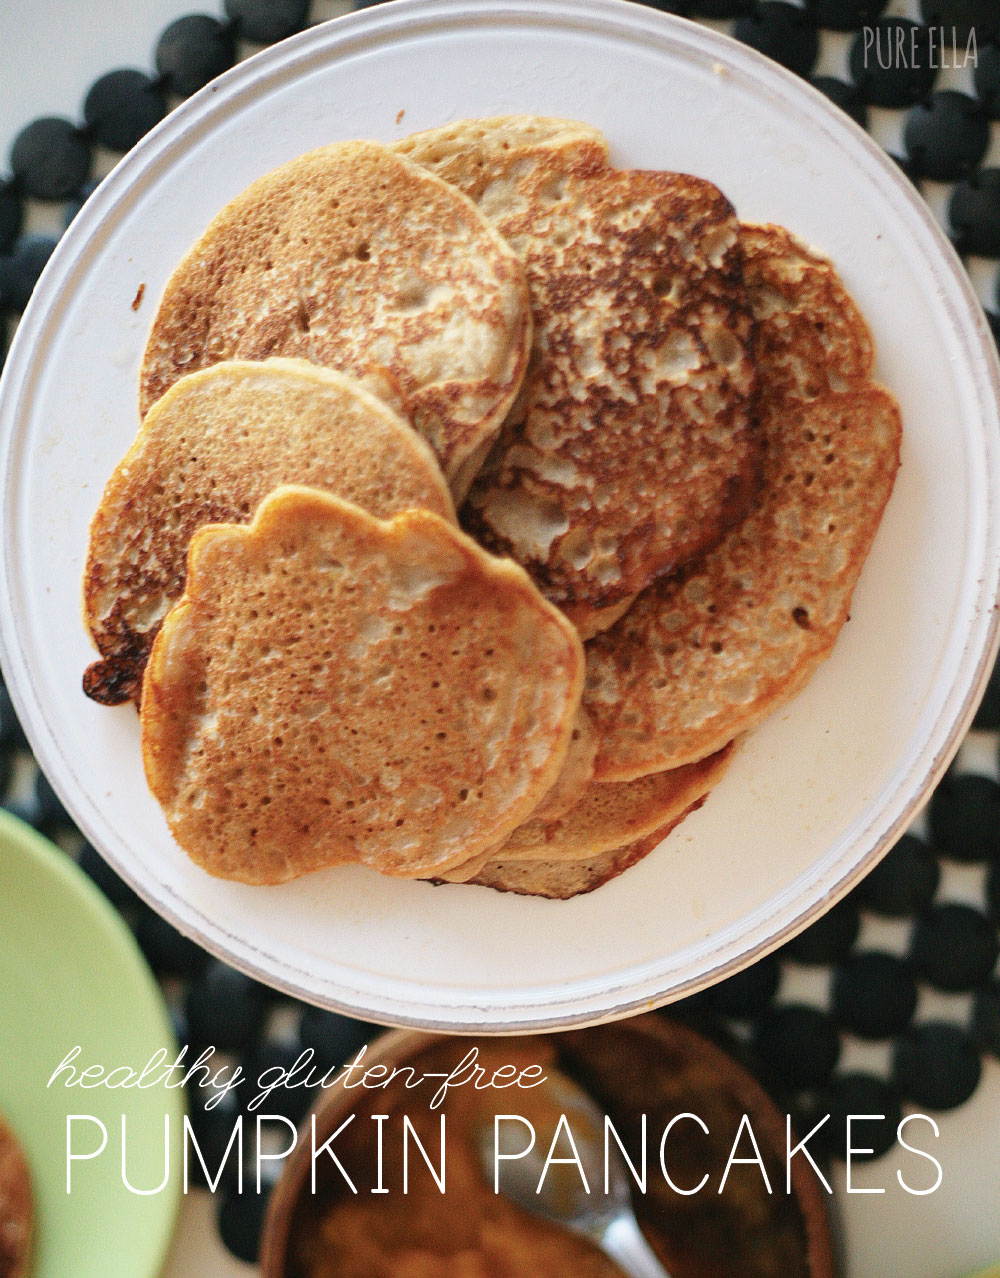 Pure-Ella-healthy-gluten-free-vegan-dairy-free-egg-free-pumpkin-pancakes